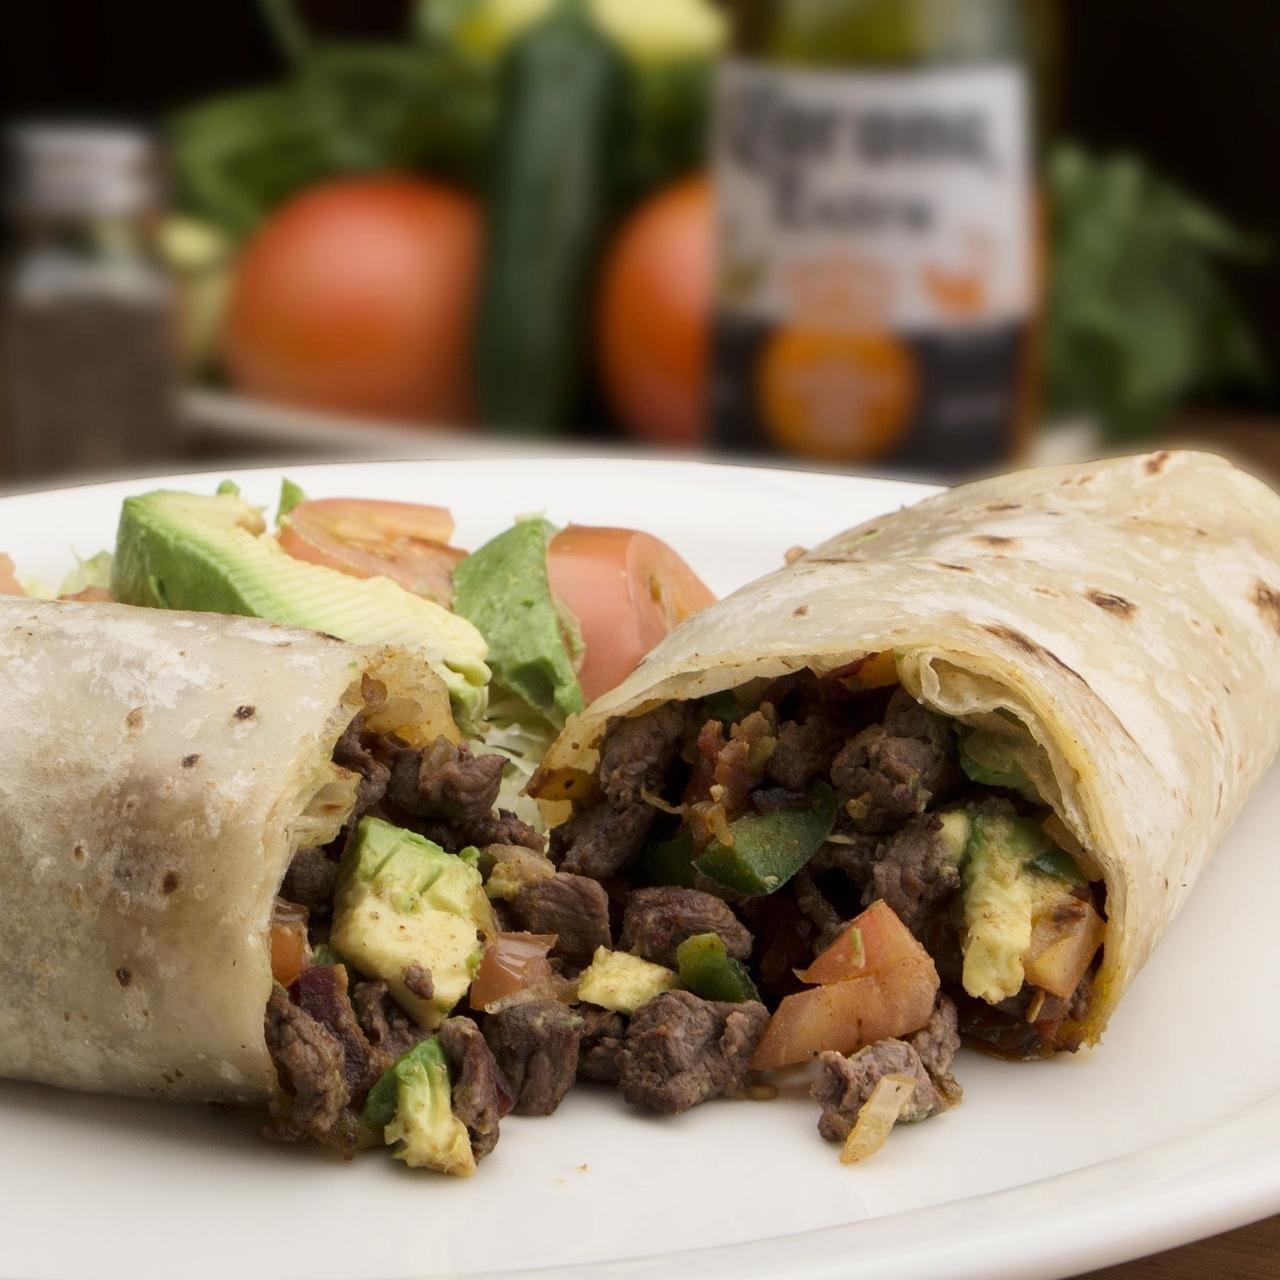 mexican-food-1561970_1920.jpg